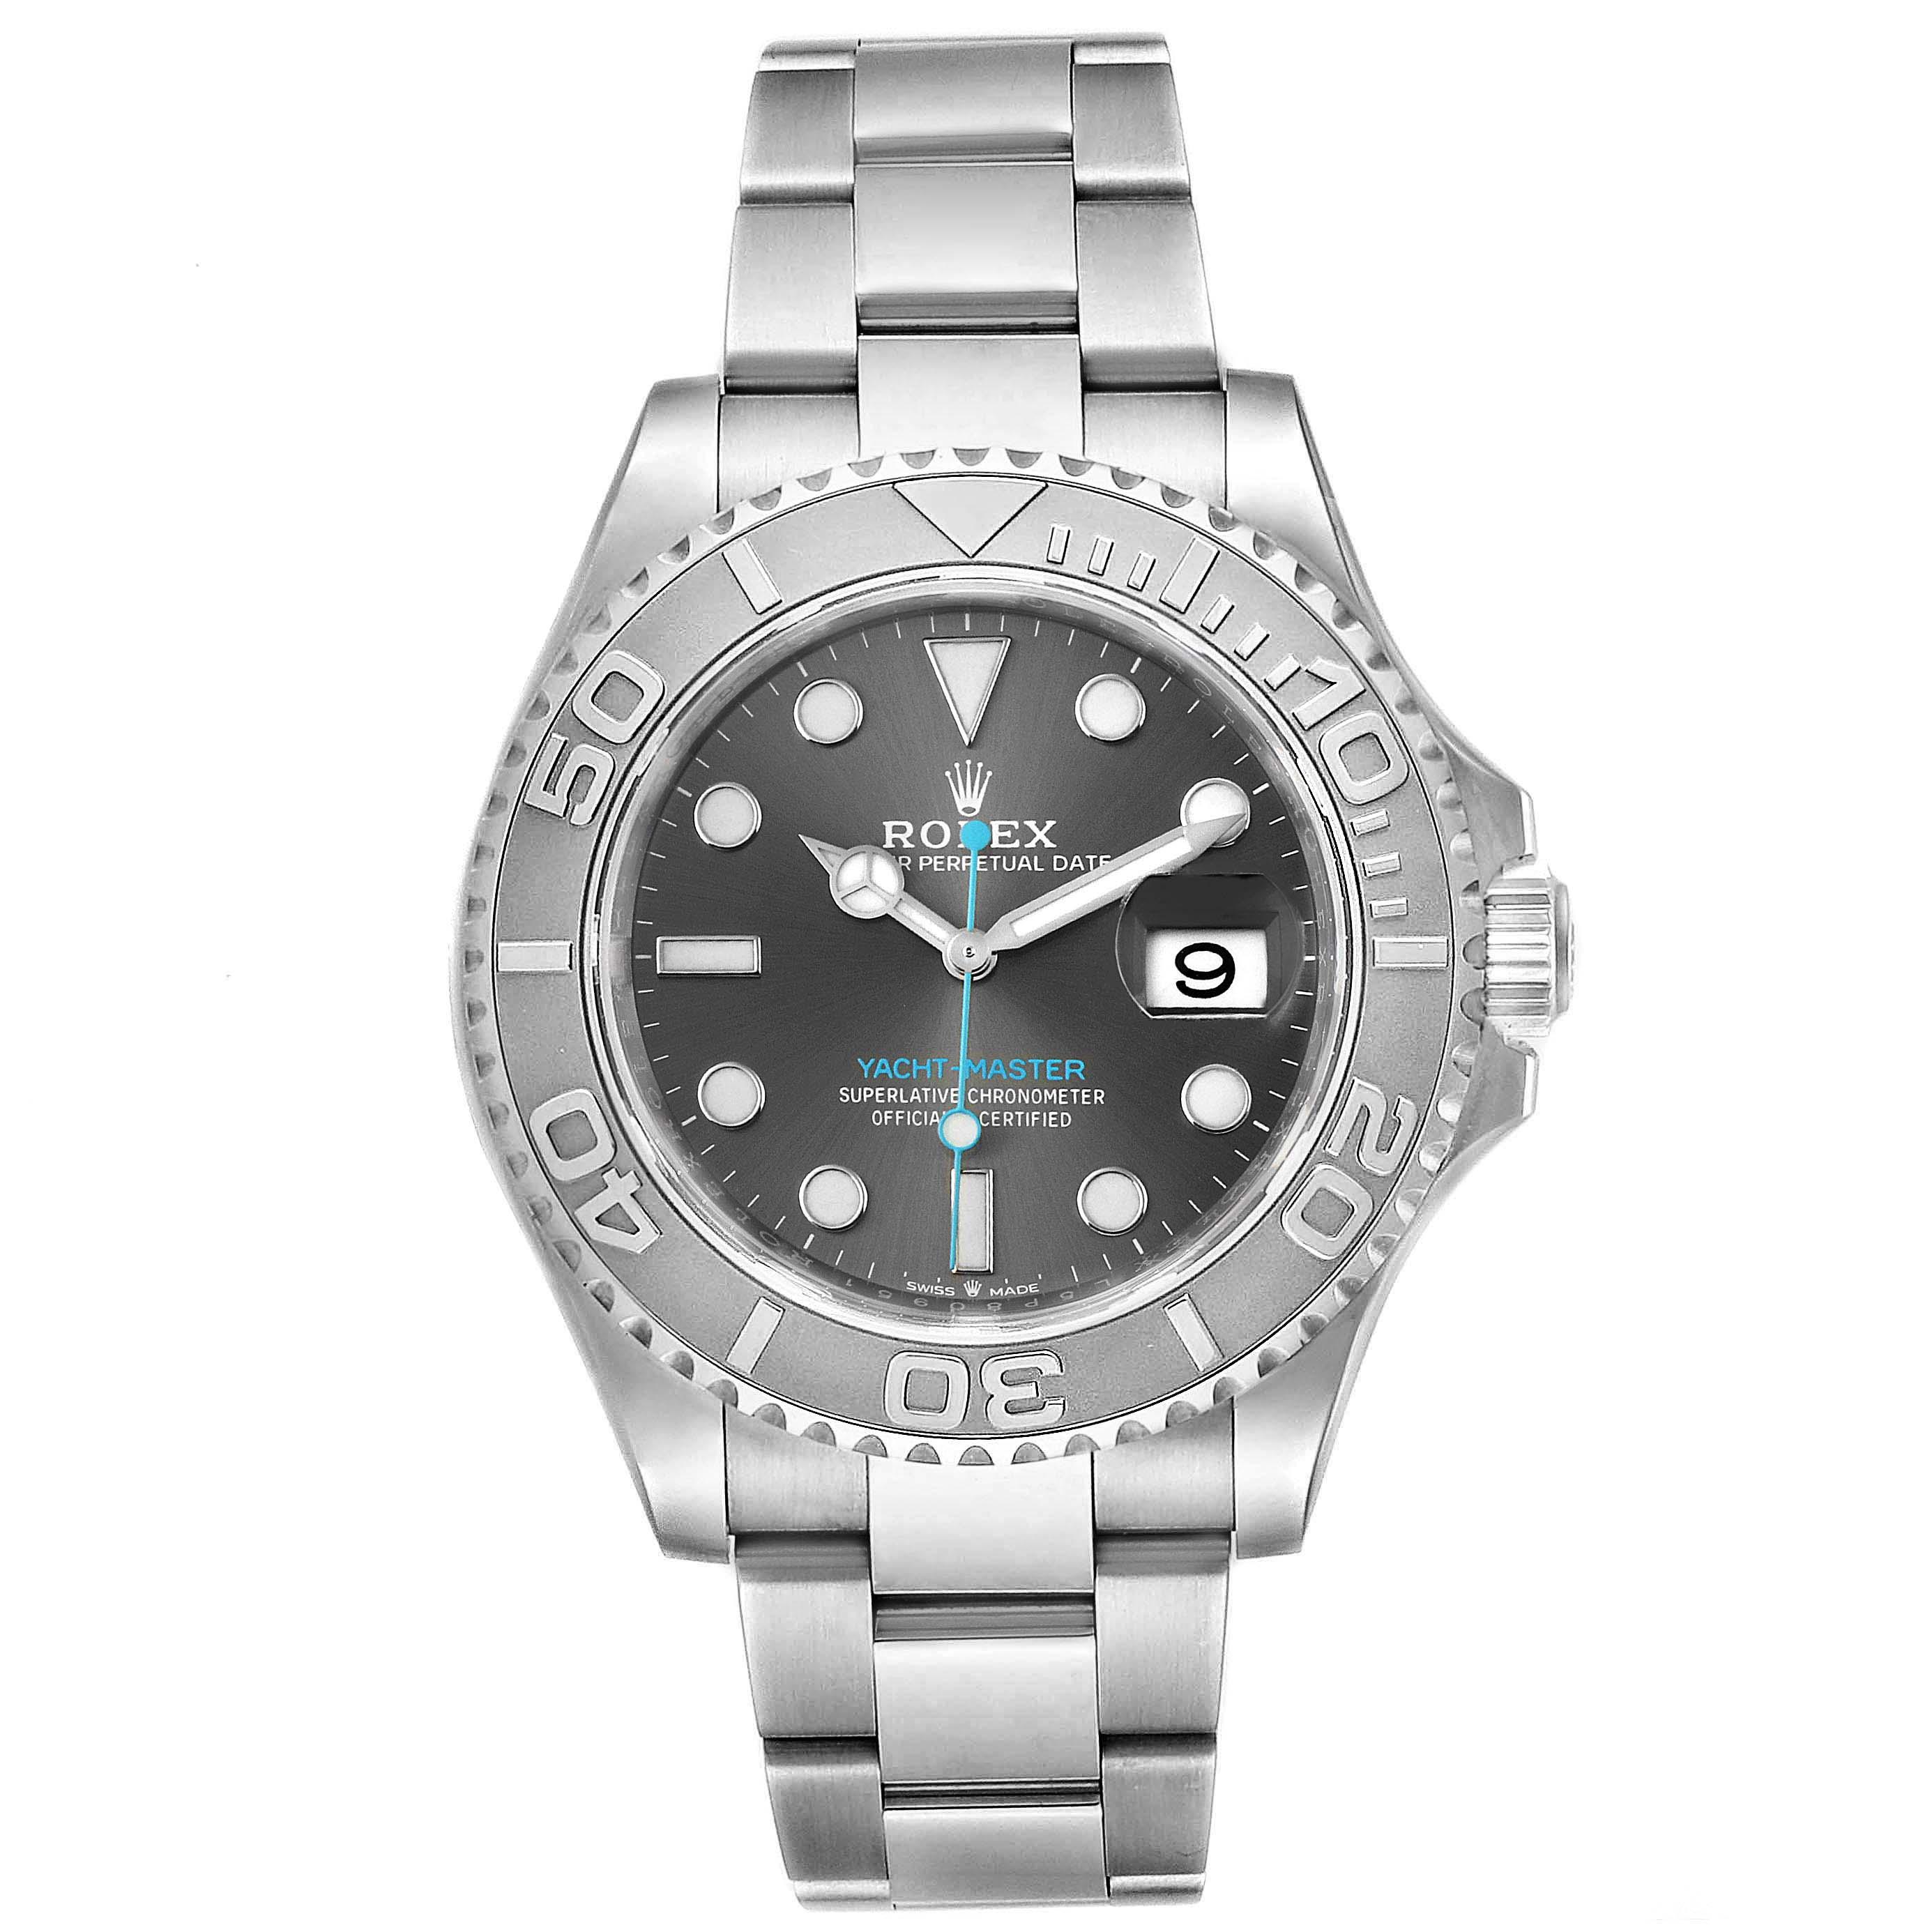 Rolex Yachtmaster Rhodium Dial Steel Platinum Mens Watch 116622 Box Card SwissWatchExpo